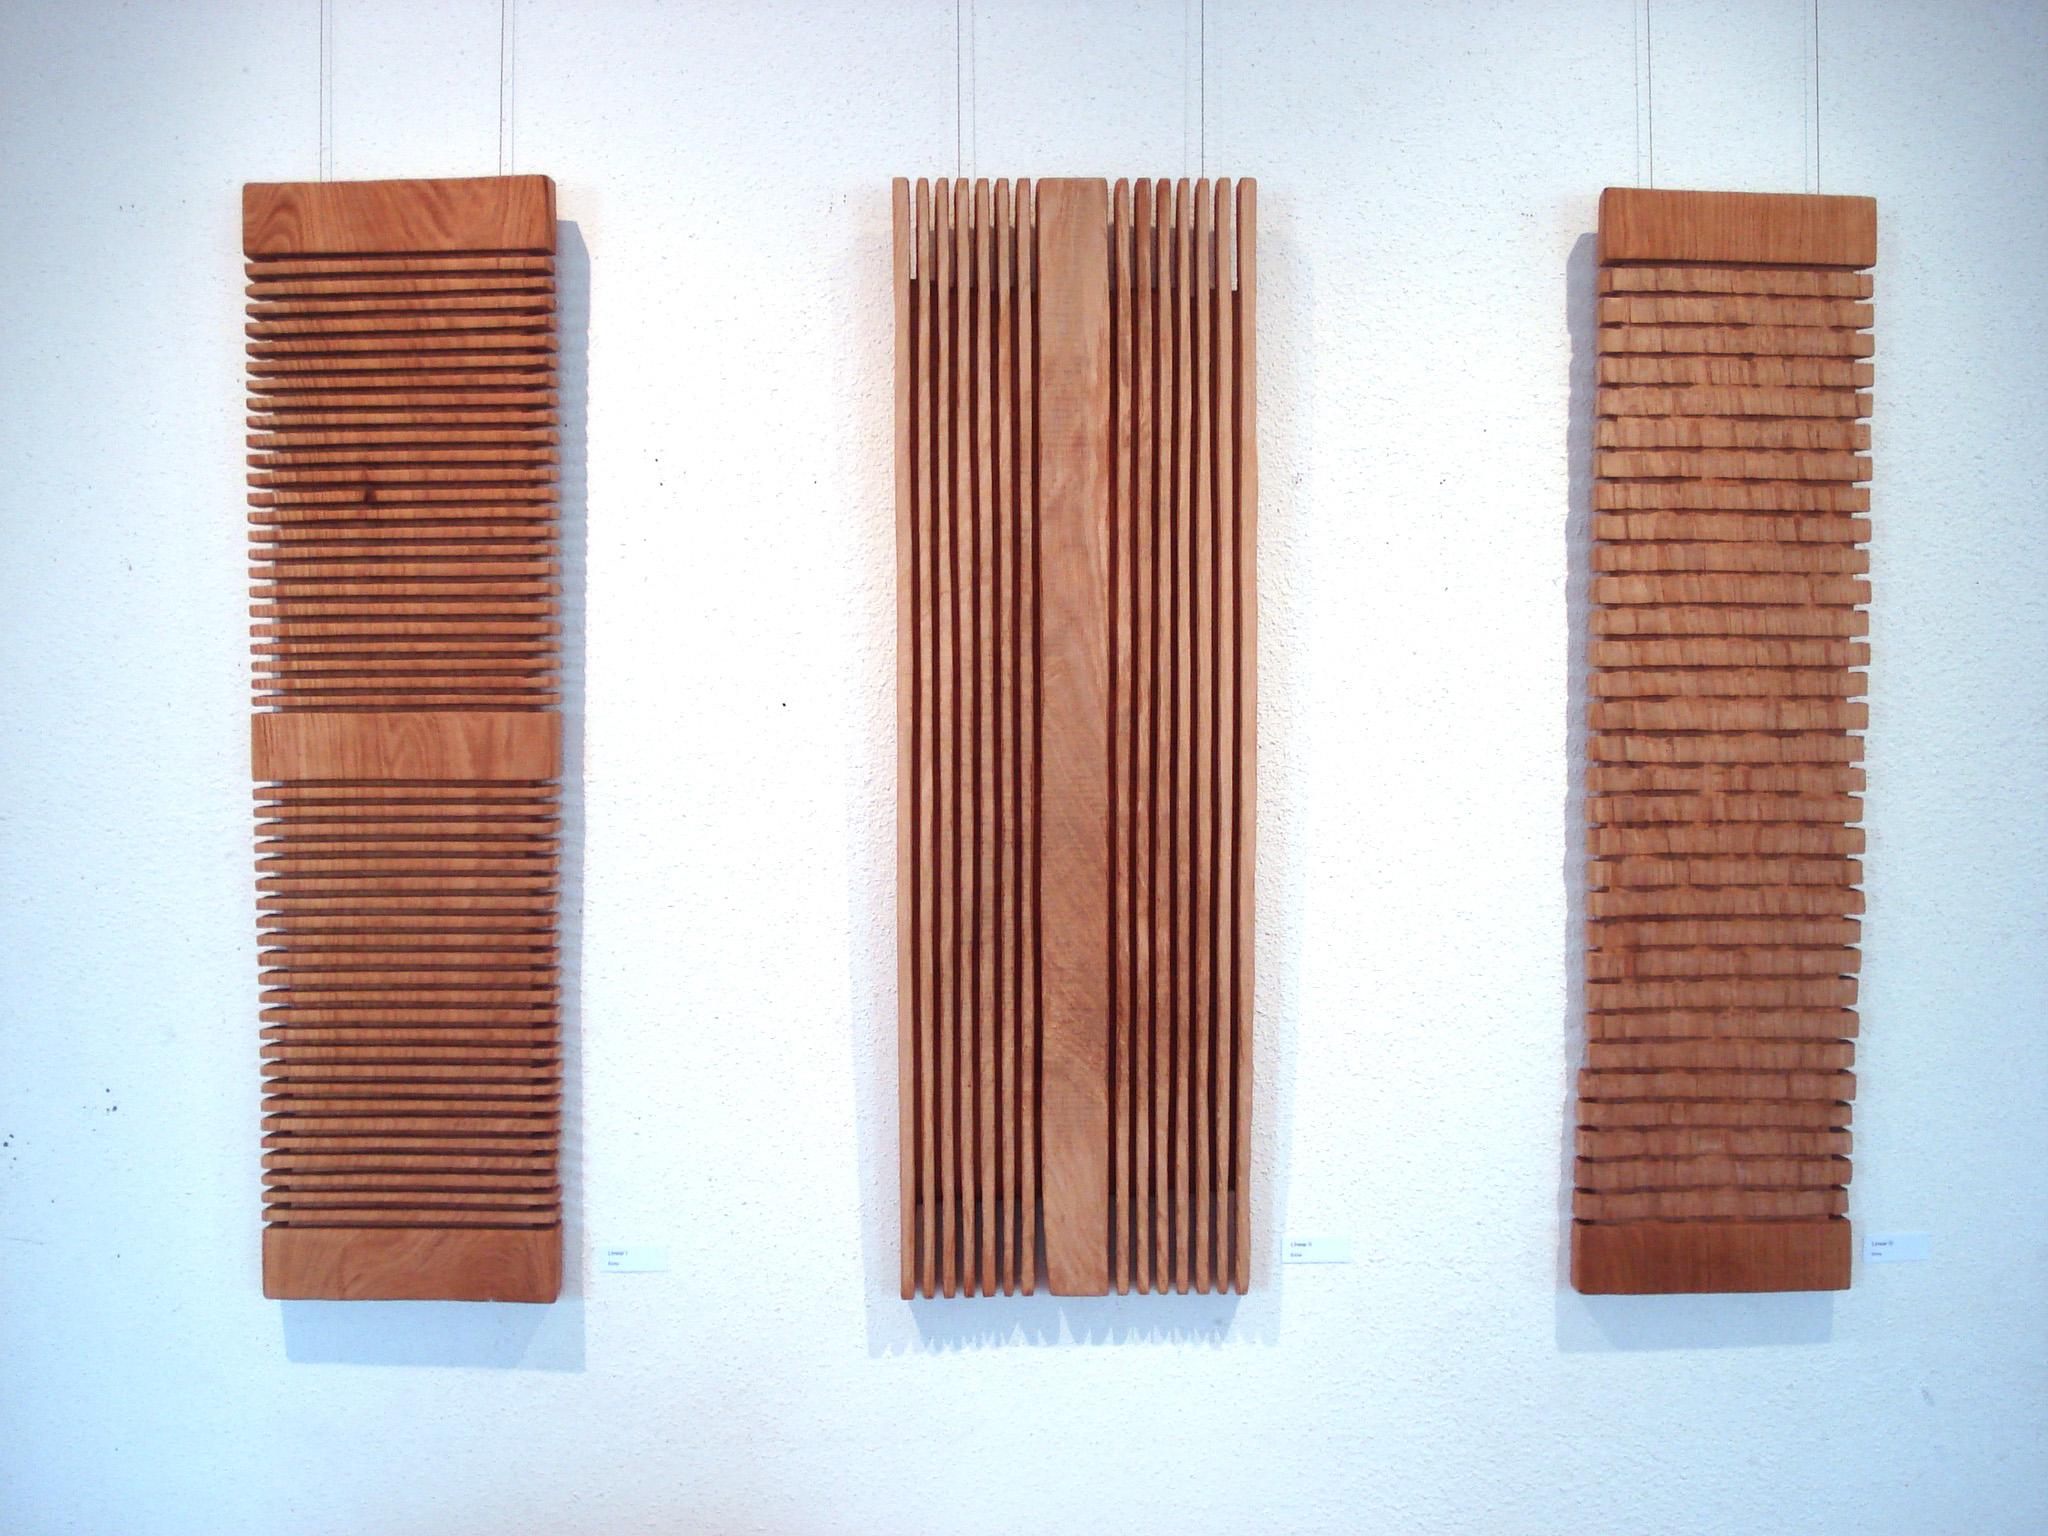 Linear 1-2-3